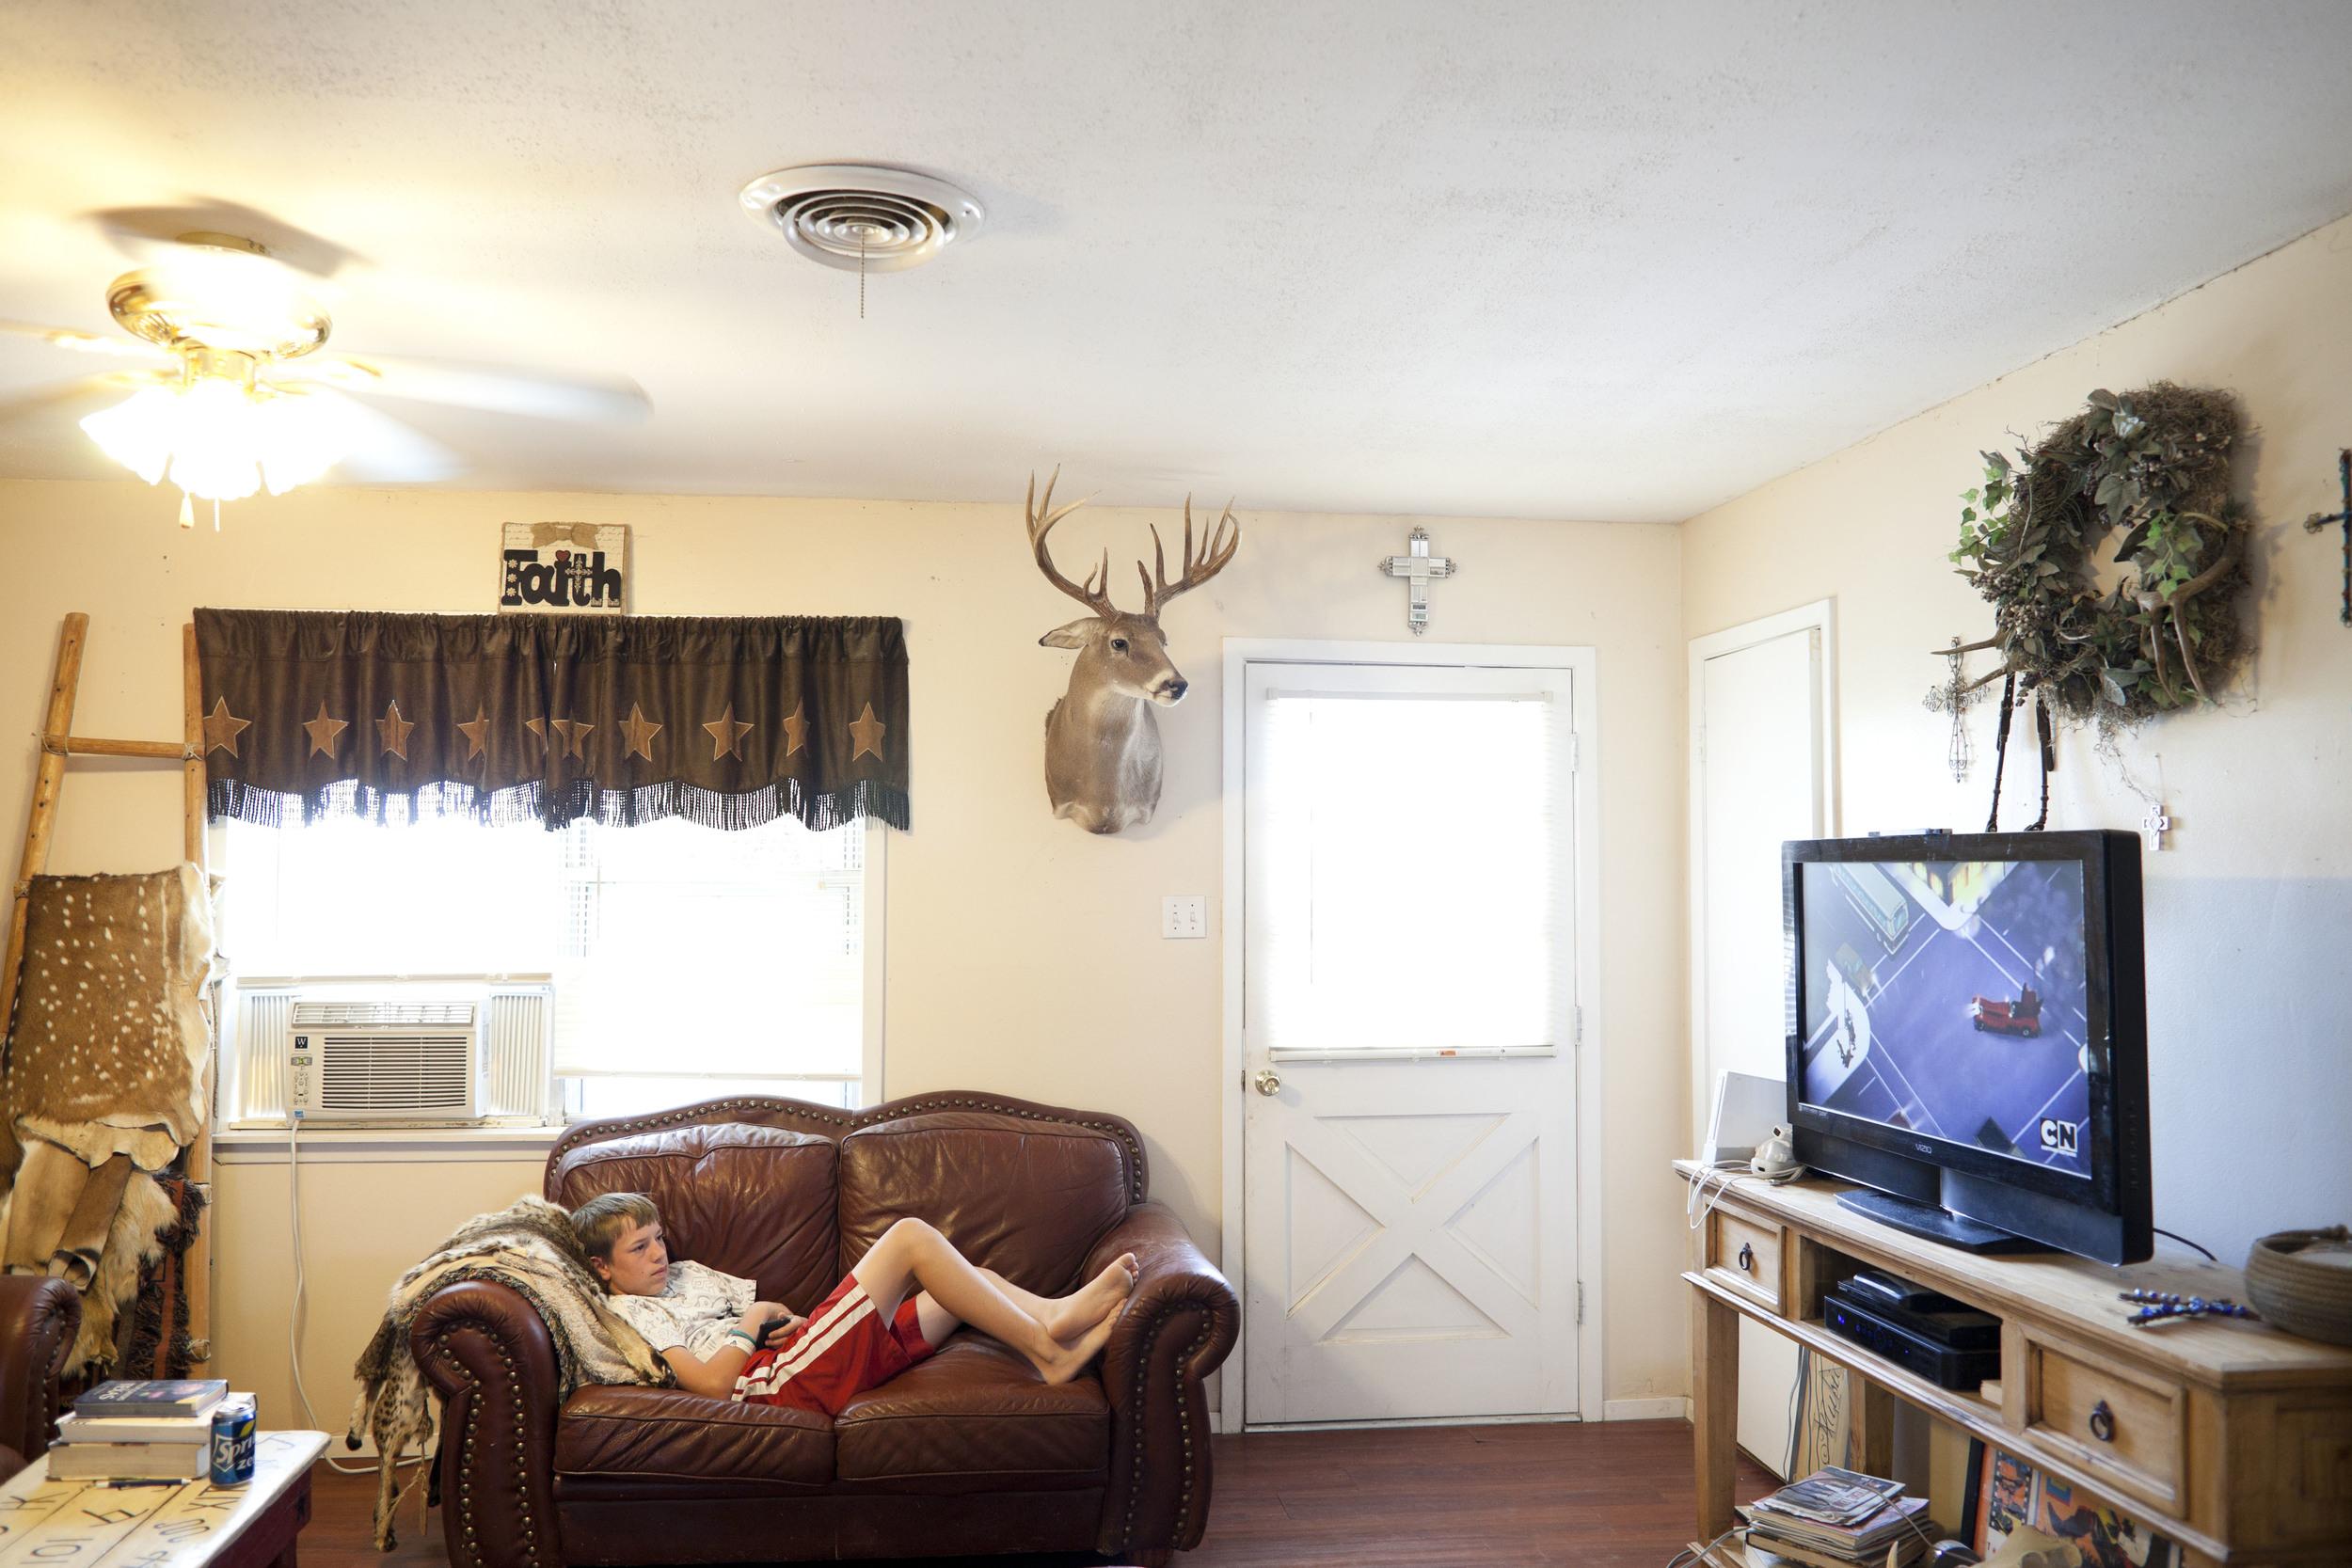 USA. Texas. Marfa. August 2013. Clayton Kibbe watching TV.